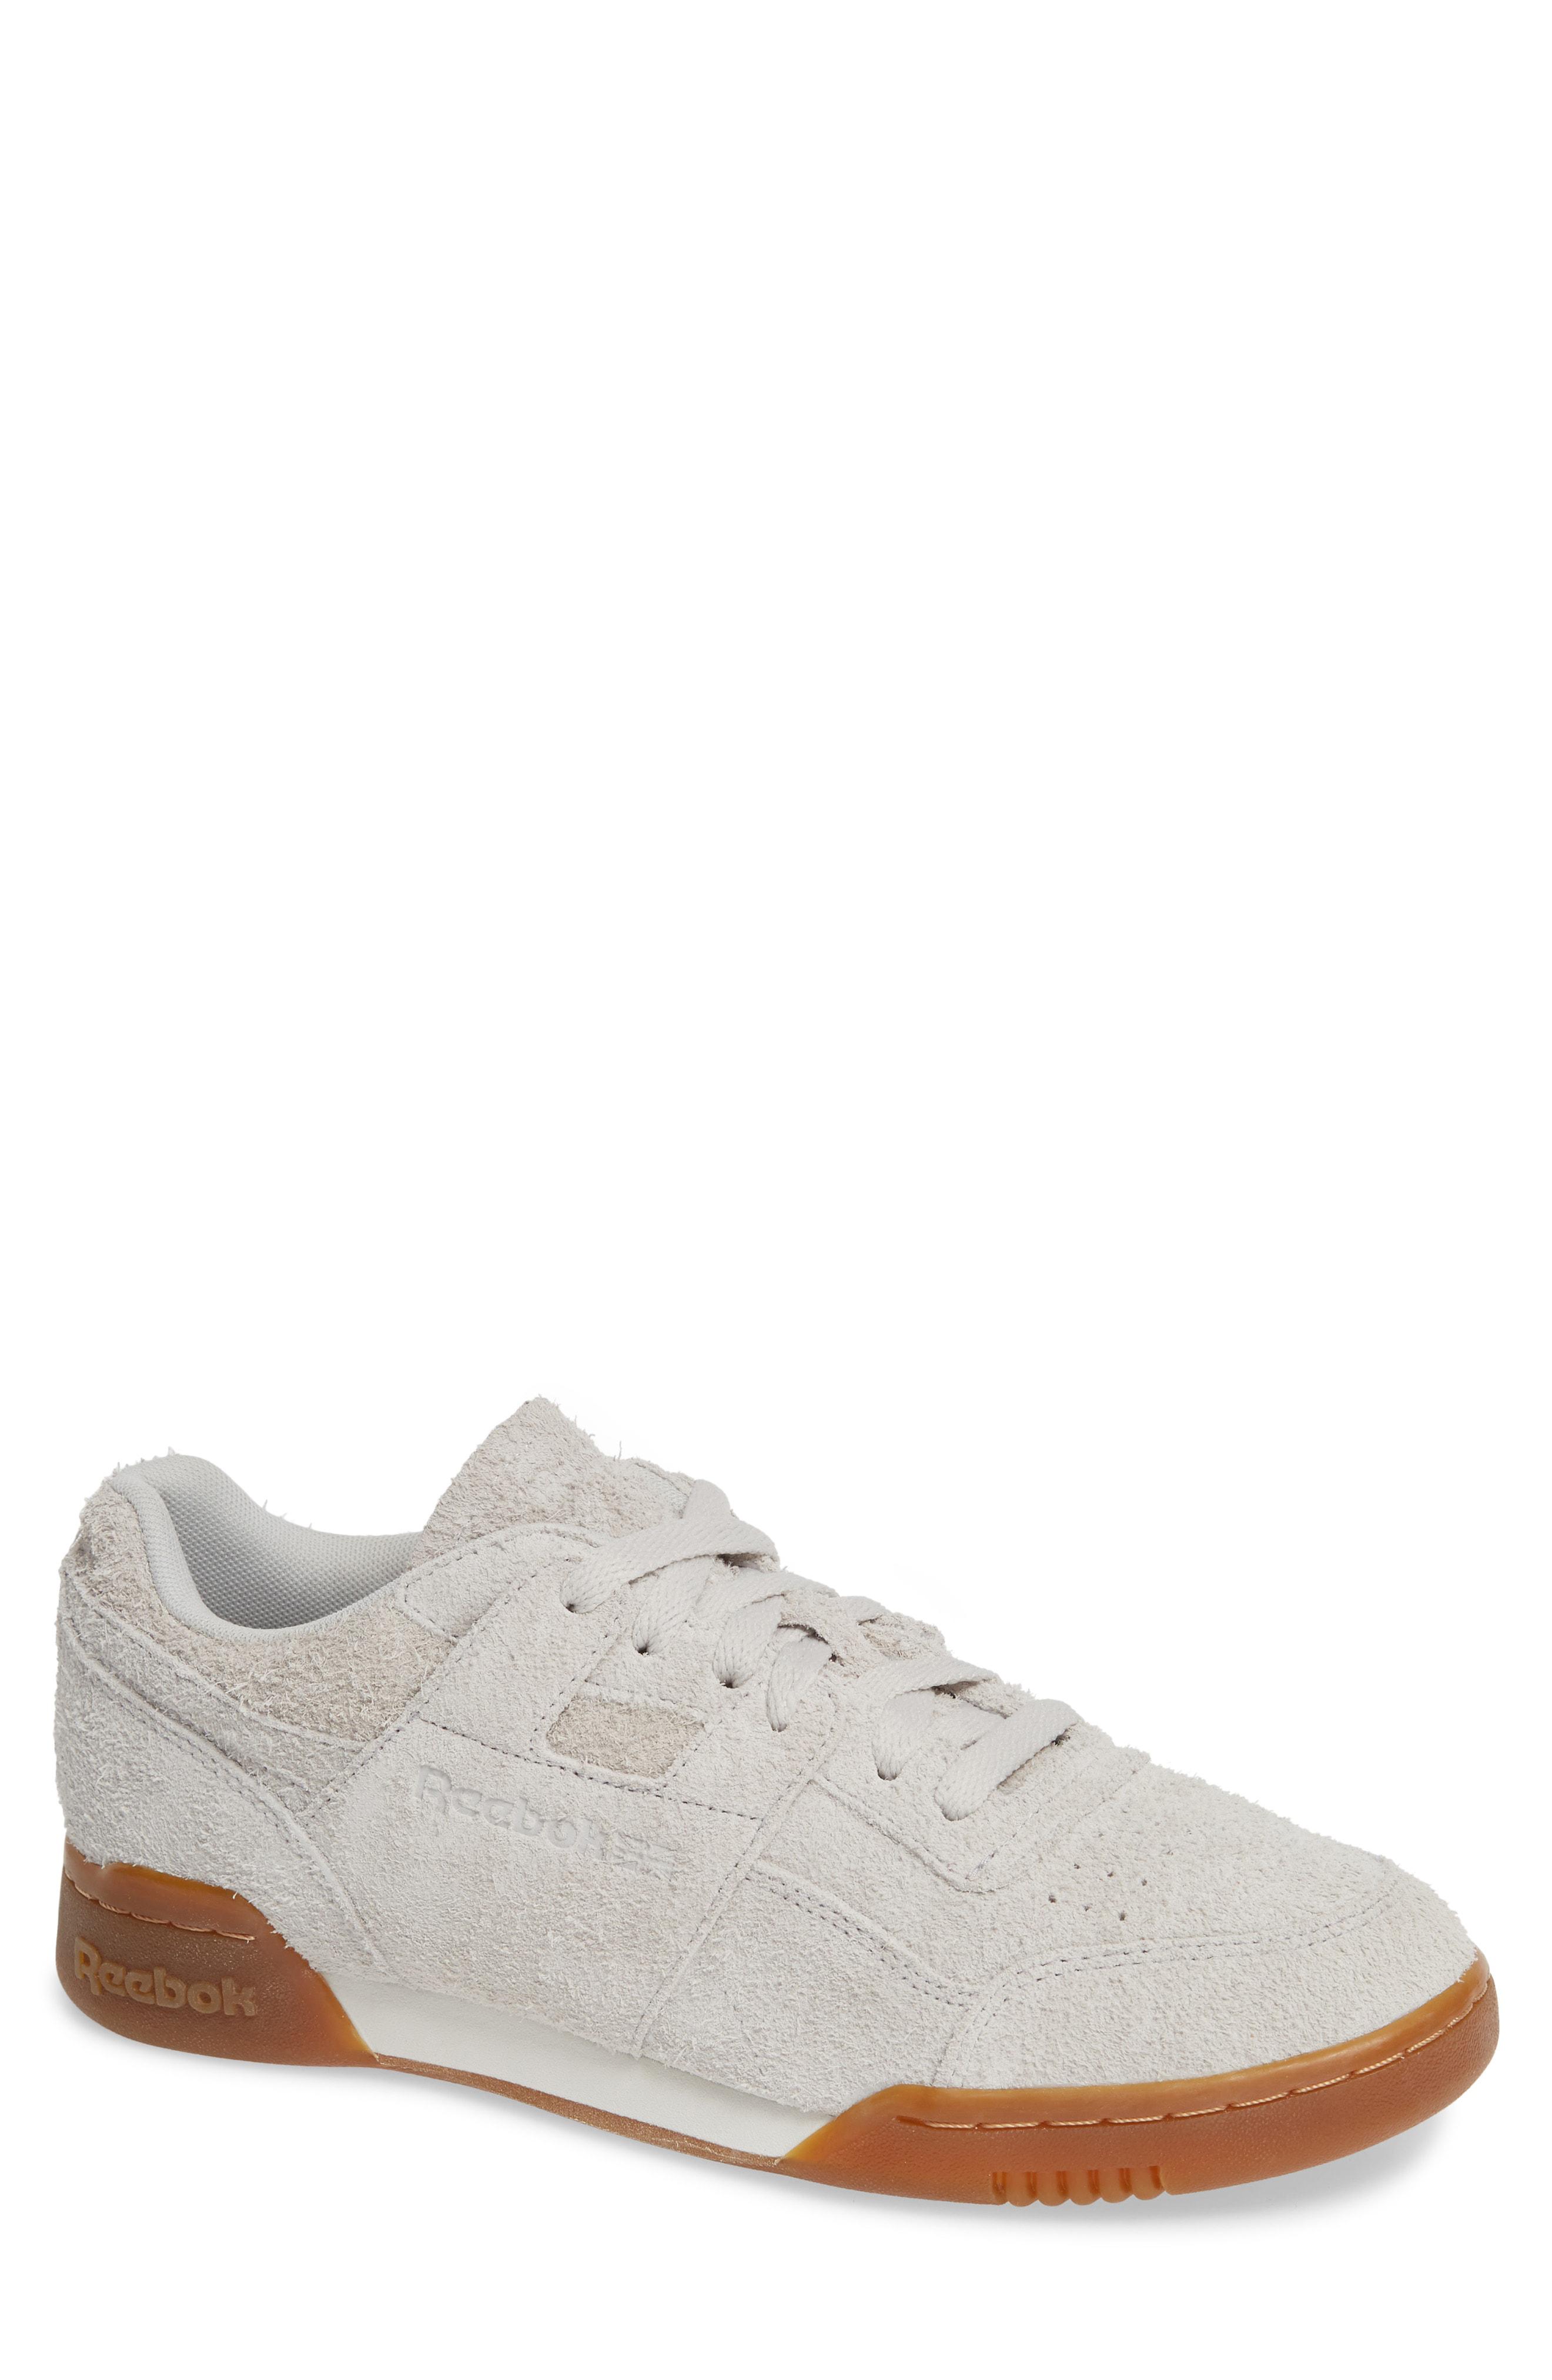 bb60c008044 Reebok Men s Workout Plus Suede Low-Top Sneakers In Grey  White  Gum ...